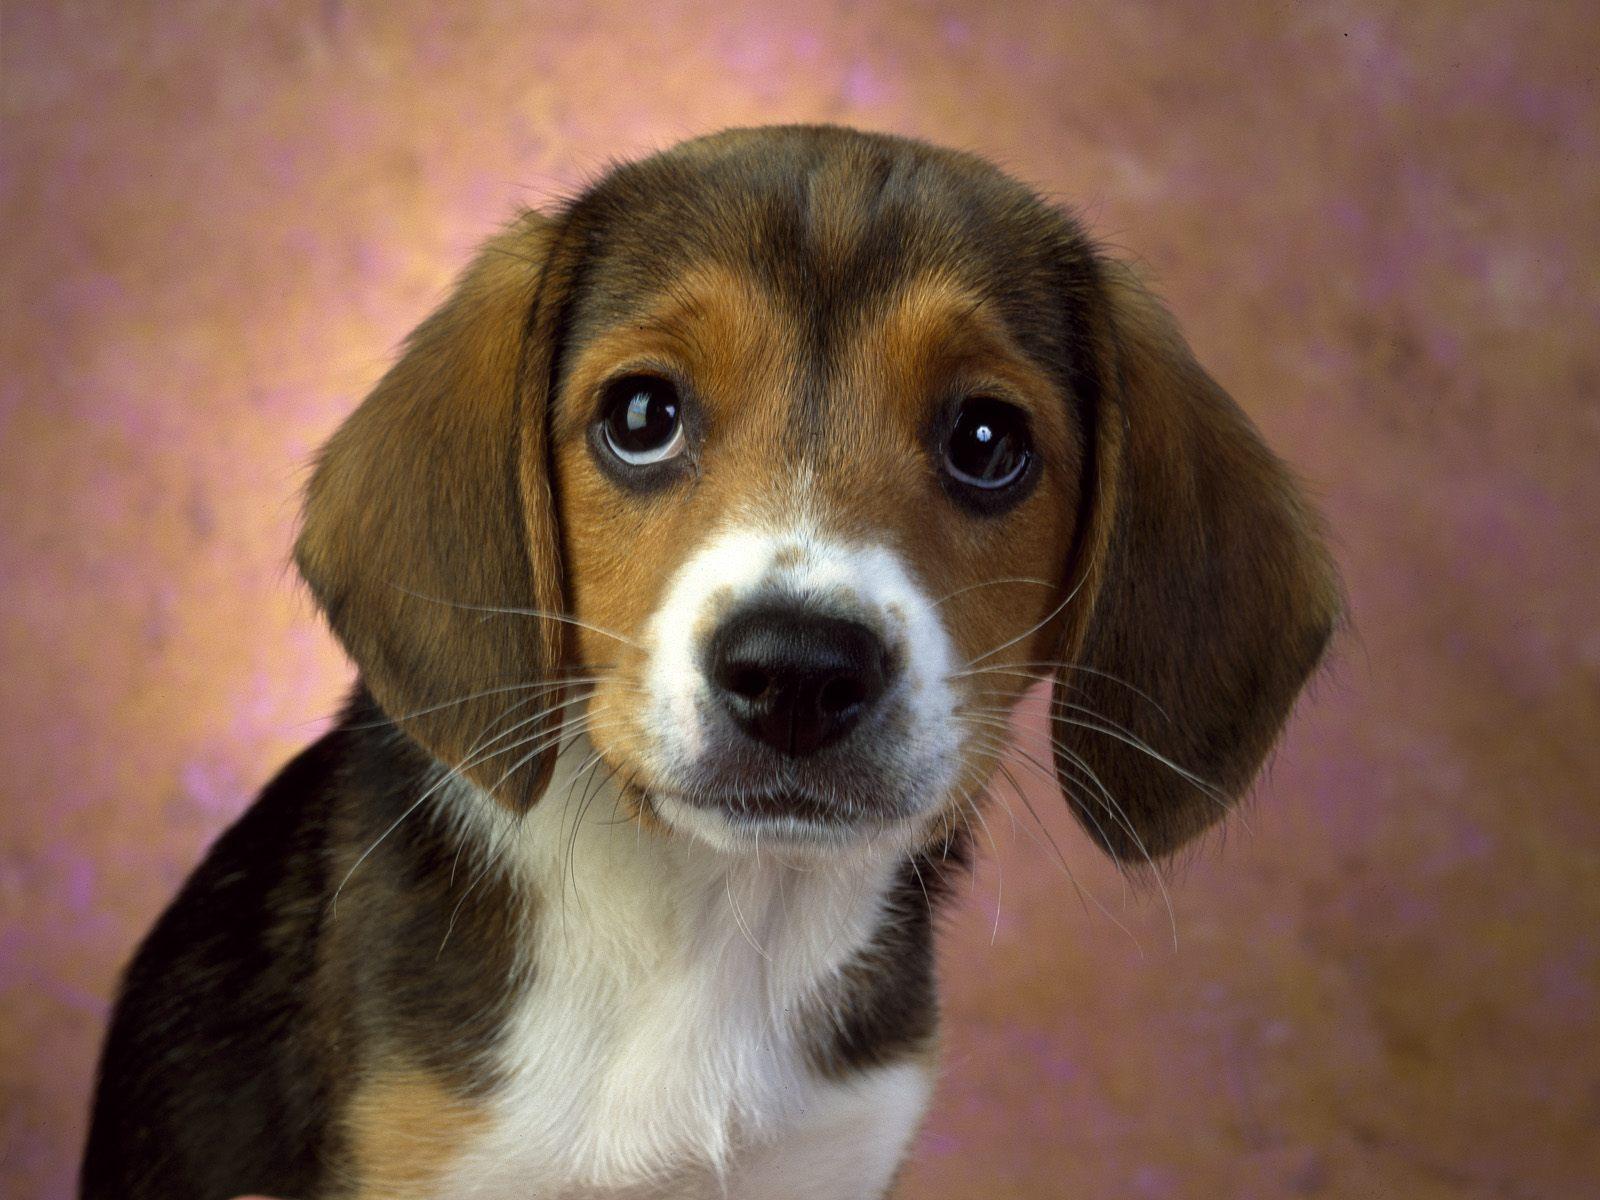 puppy-eyes-beagle